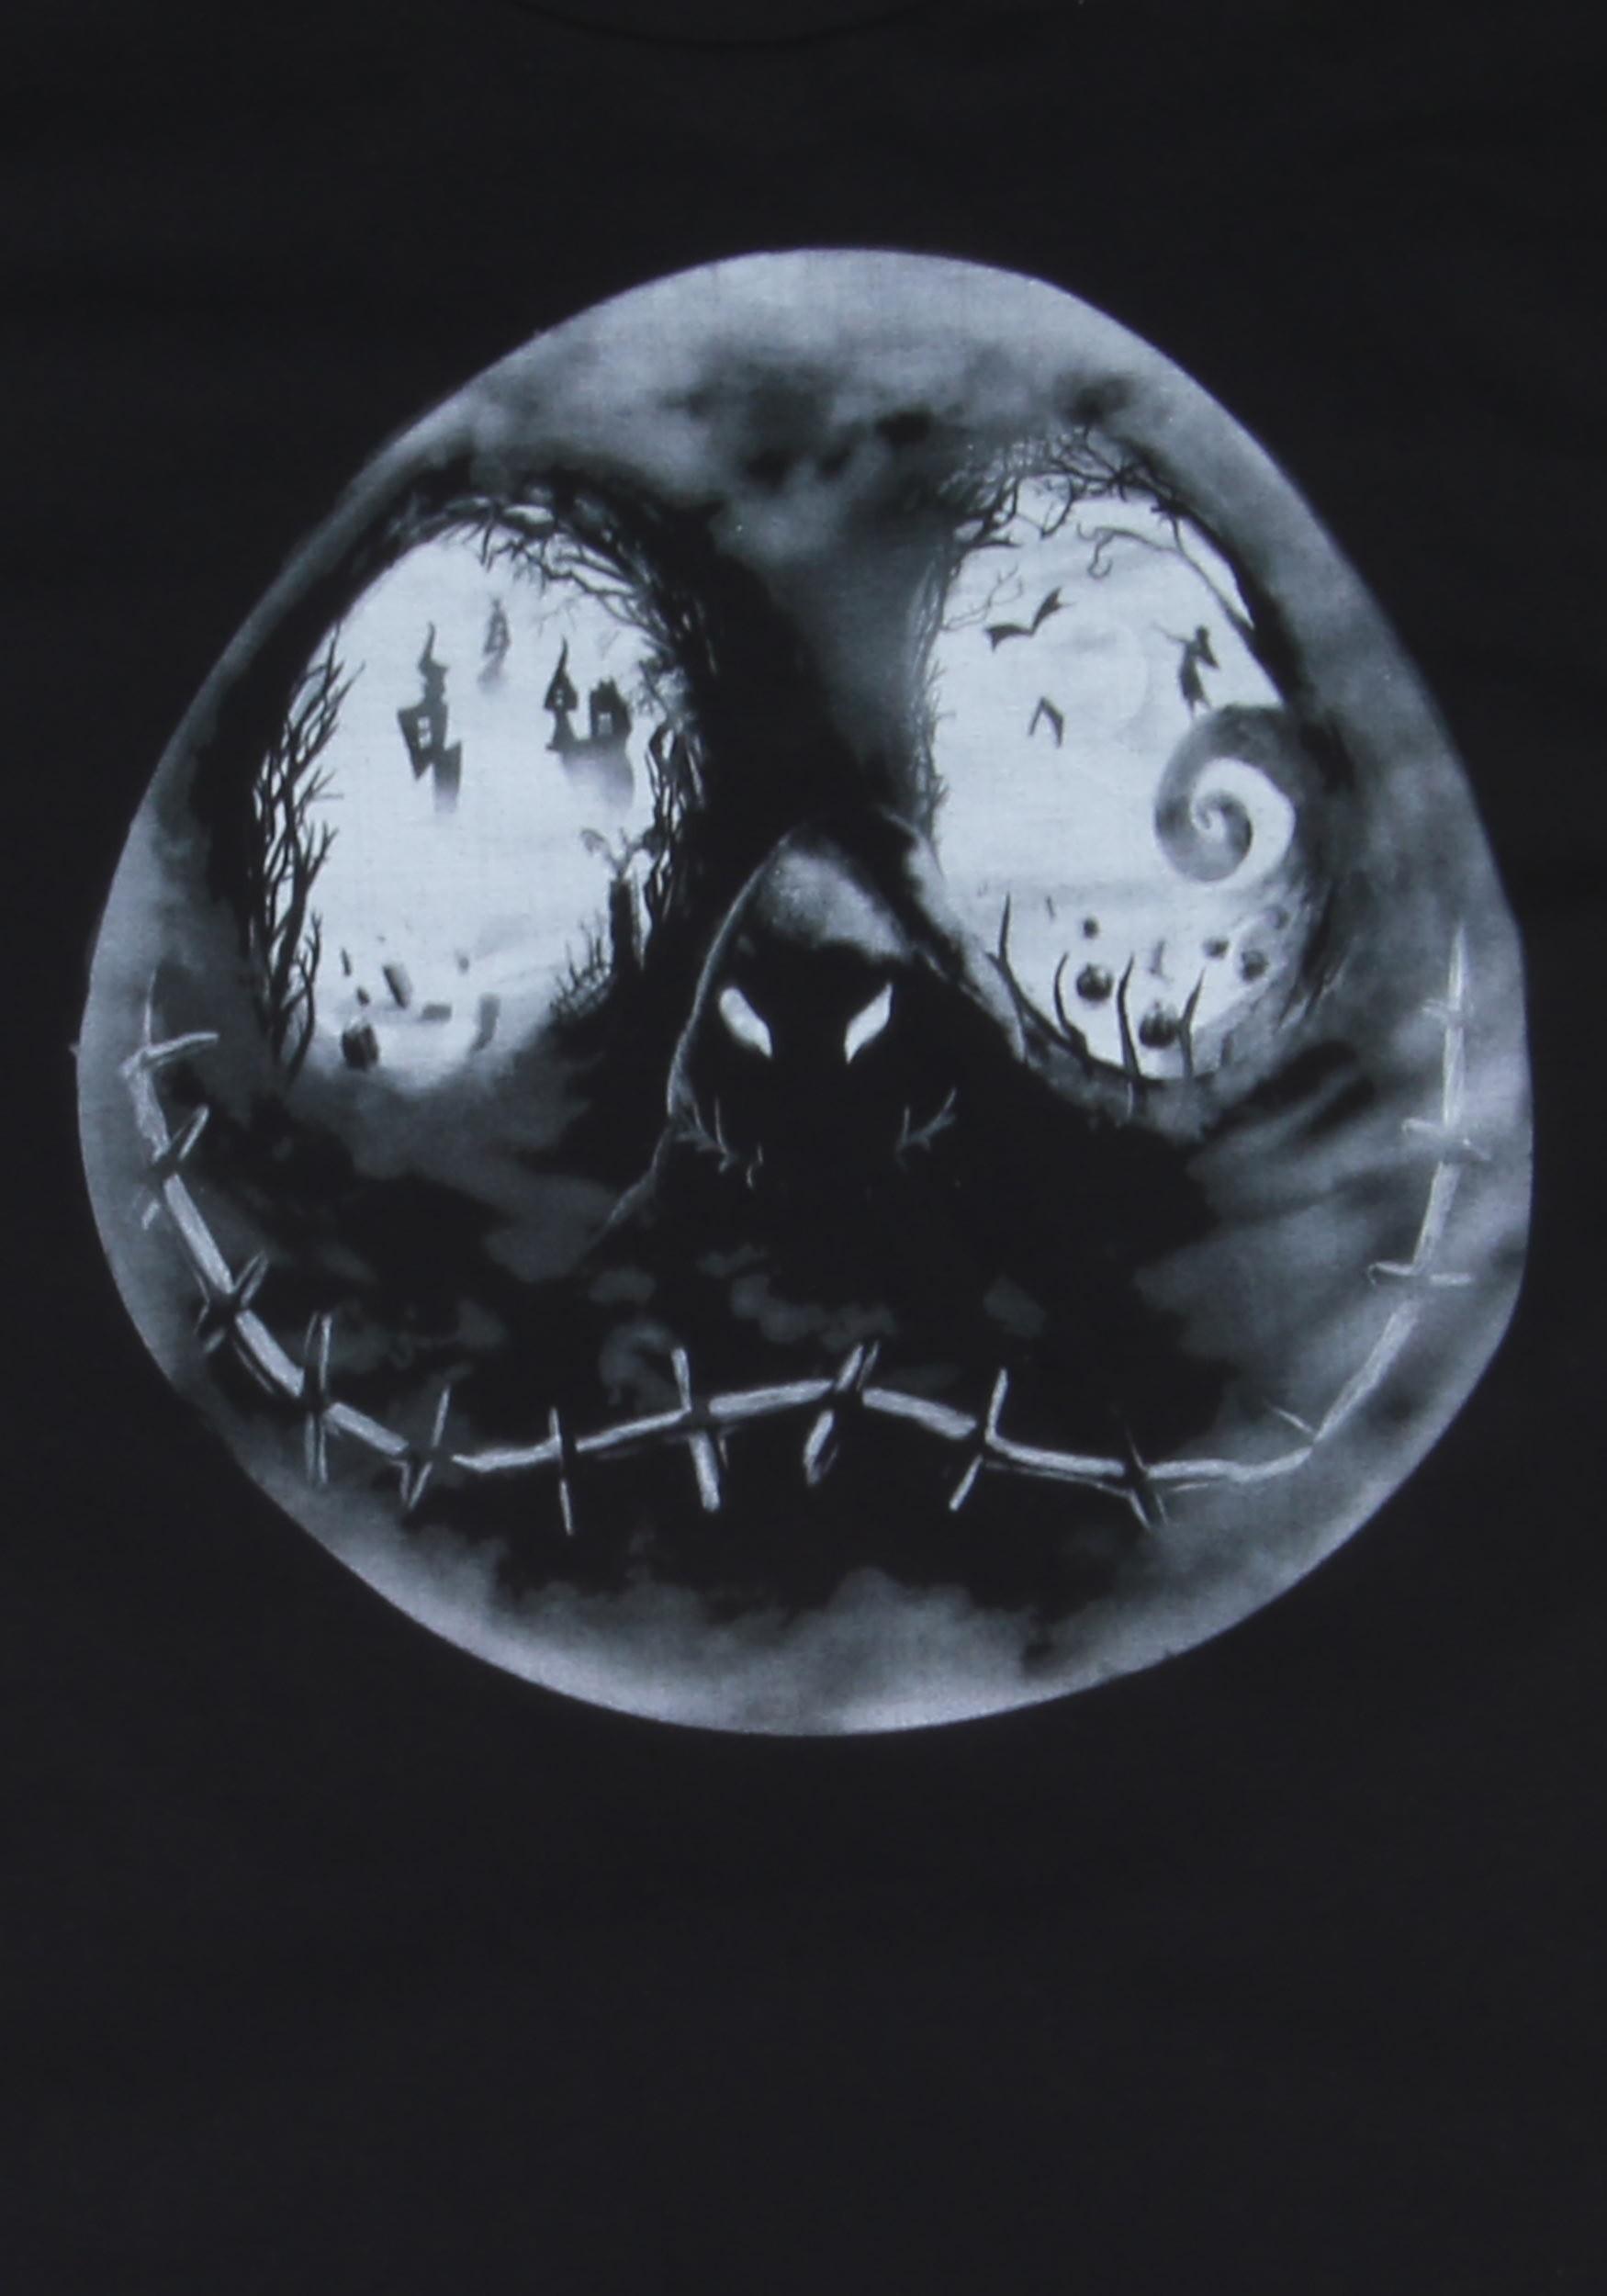 Jack the Skeleton Wallpaper (67+ images)  The Nightmare Before Christmas Jack Makeup